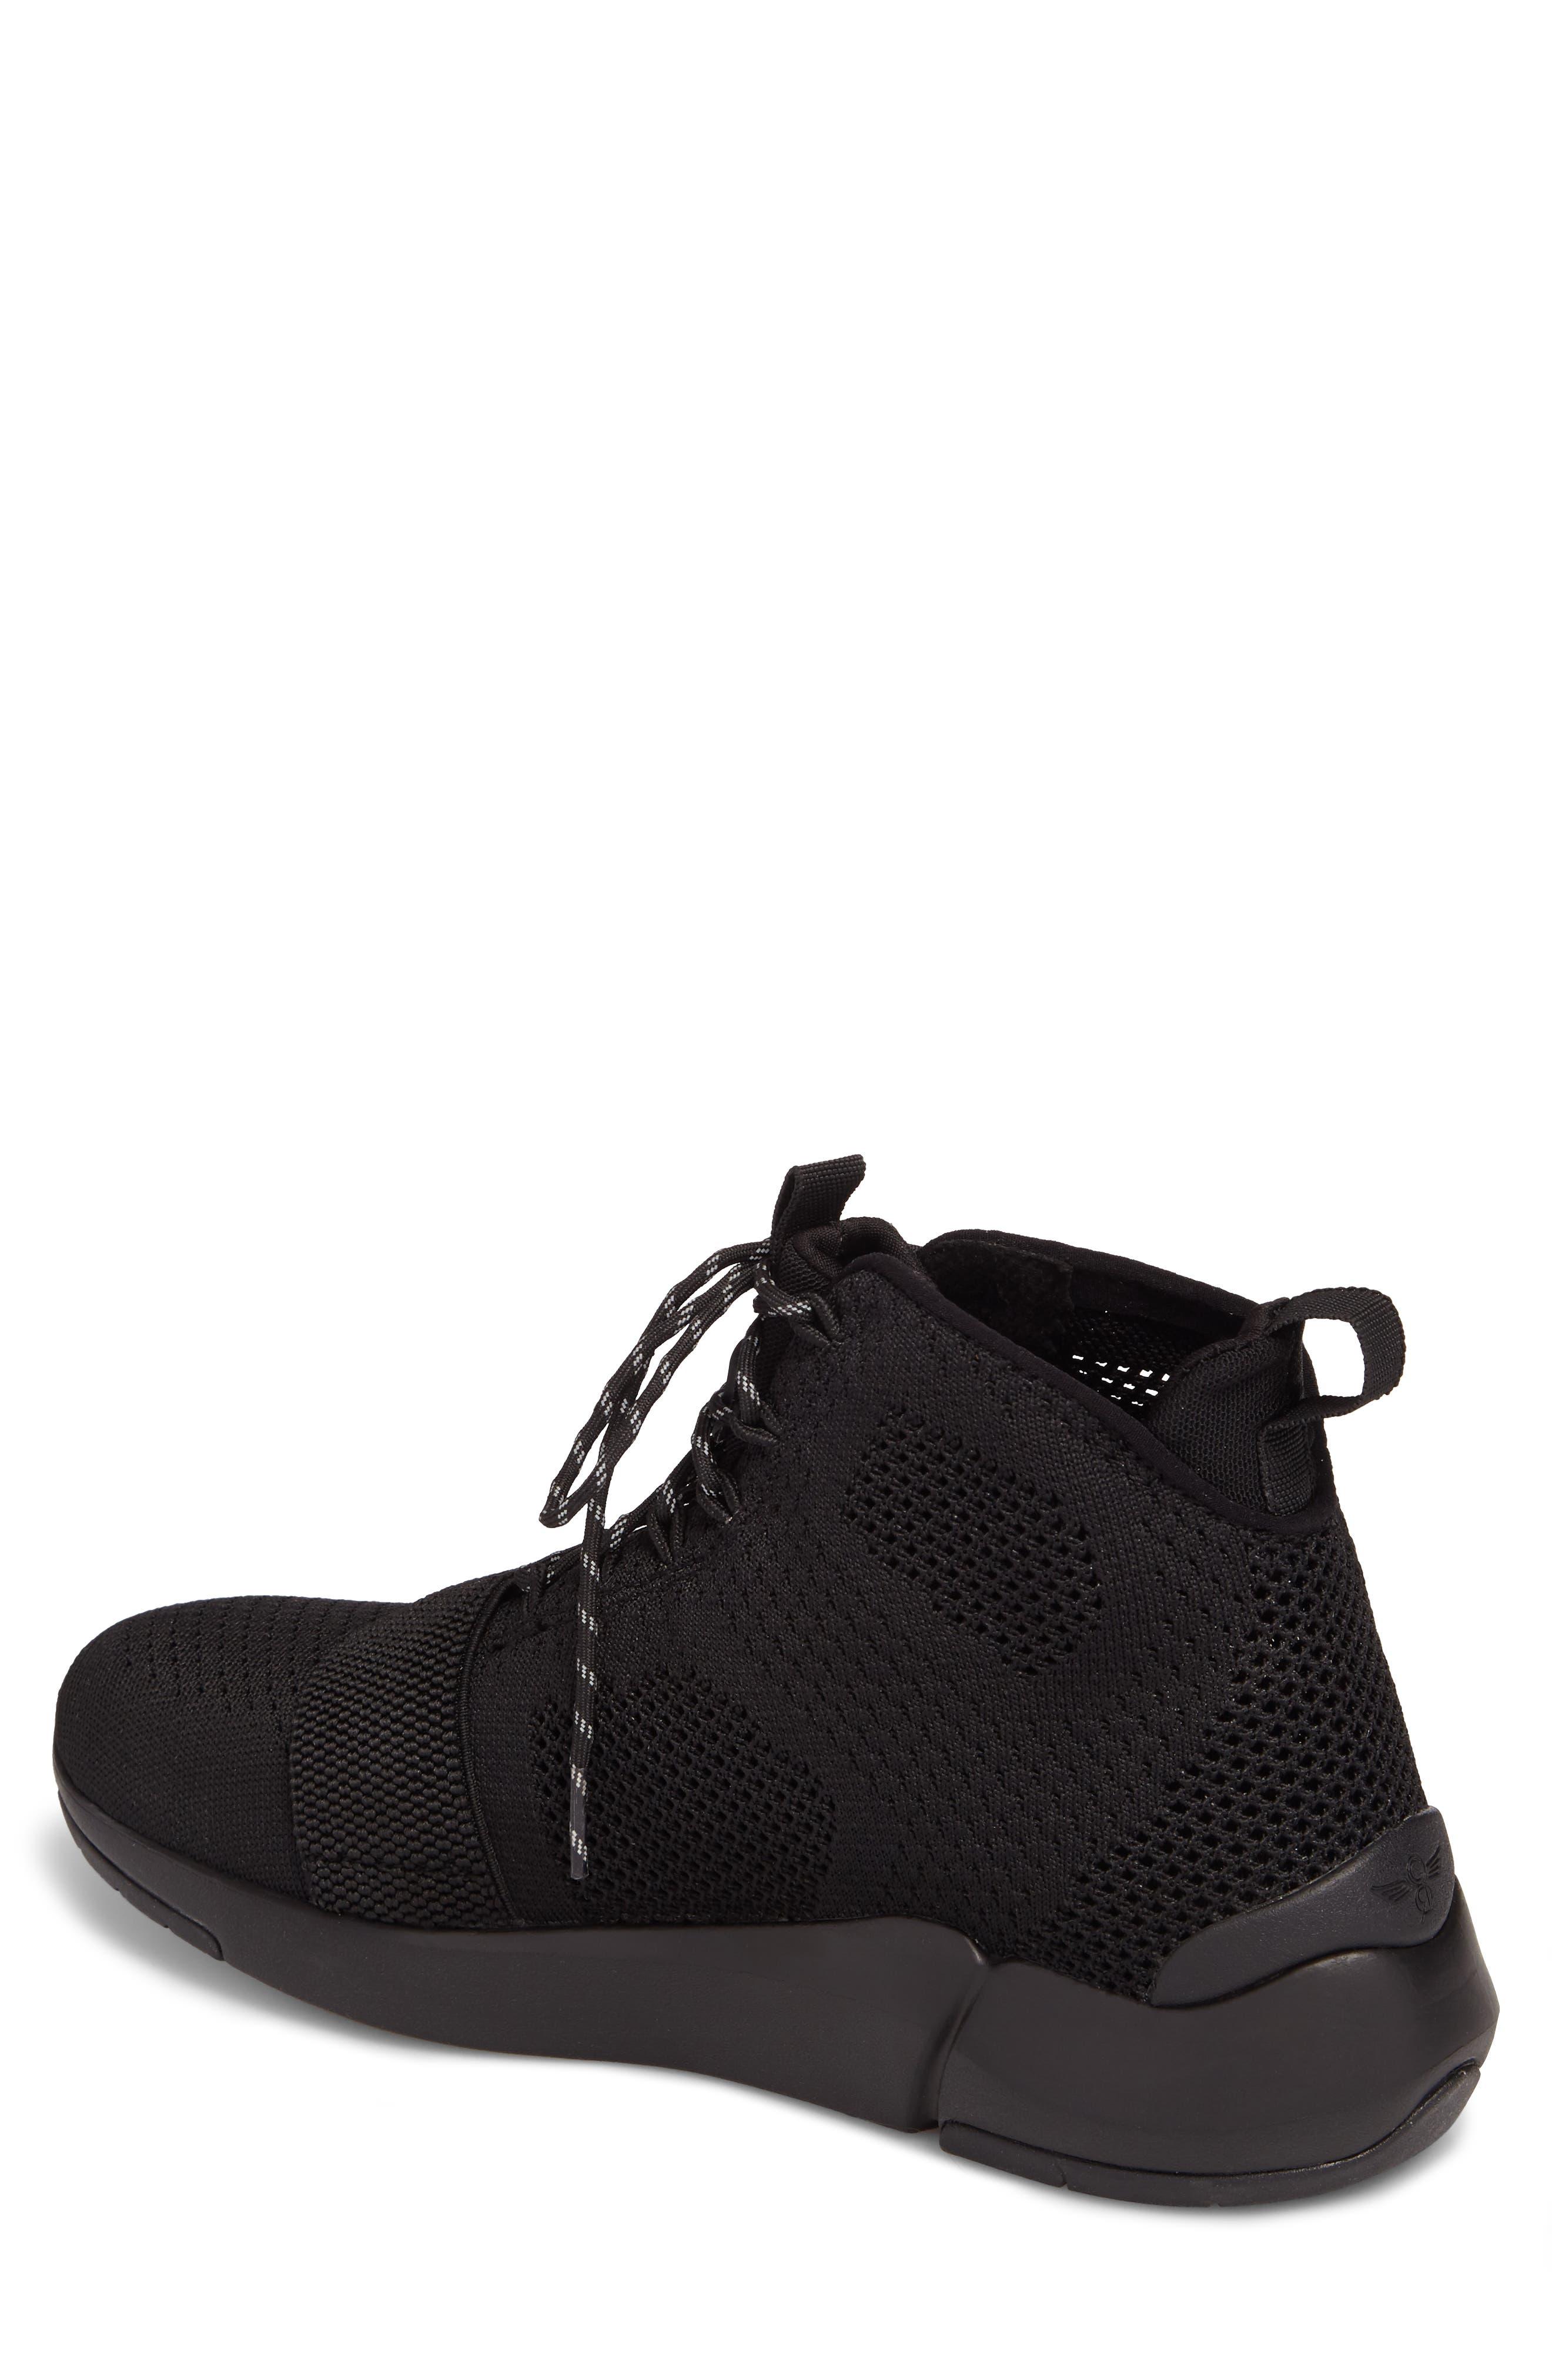 Modica Sneaker,                             Alternate thumbnail 2, color,                             012